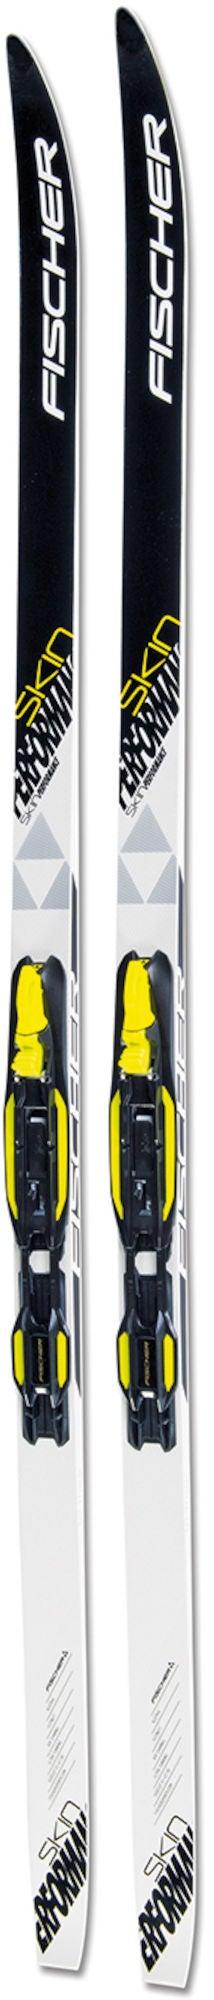 Fischer Skin Performance JR IFP Längdskidor 117 cm